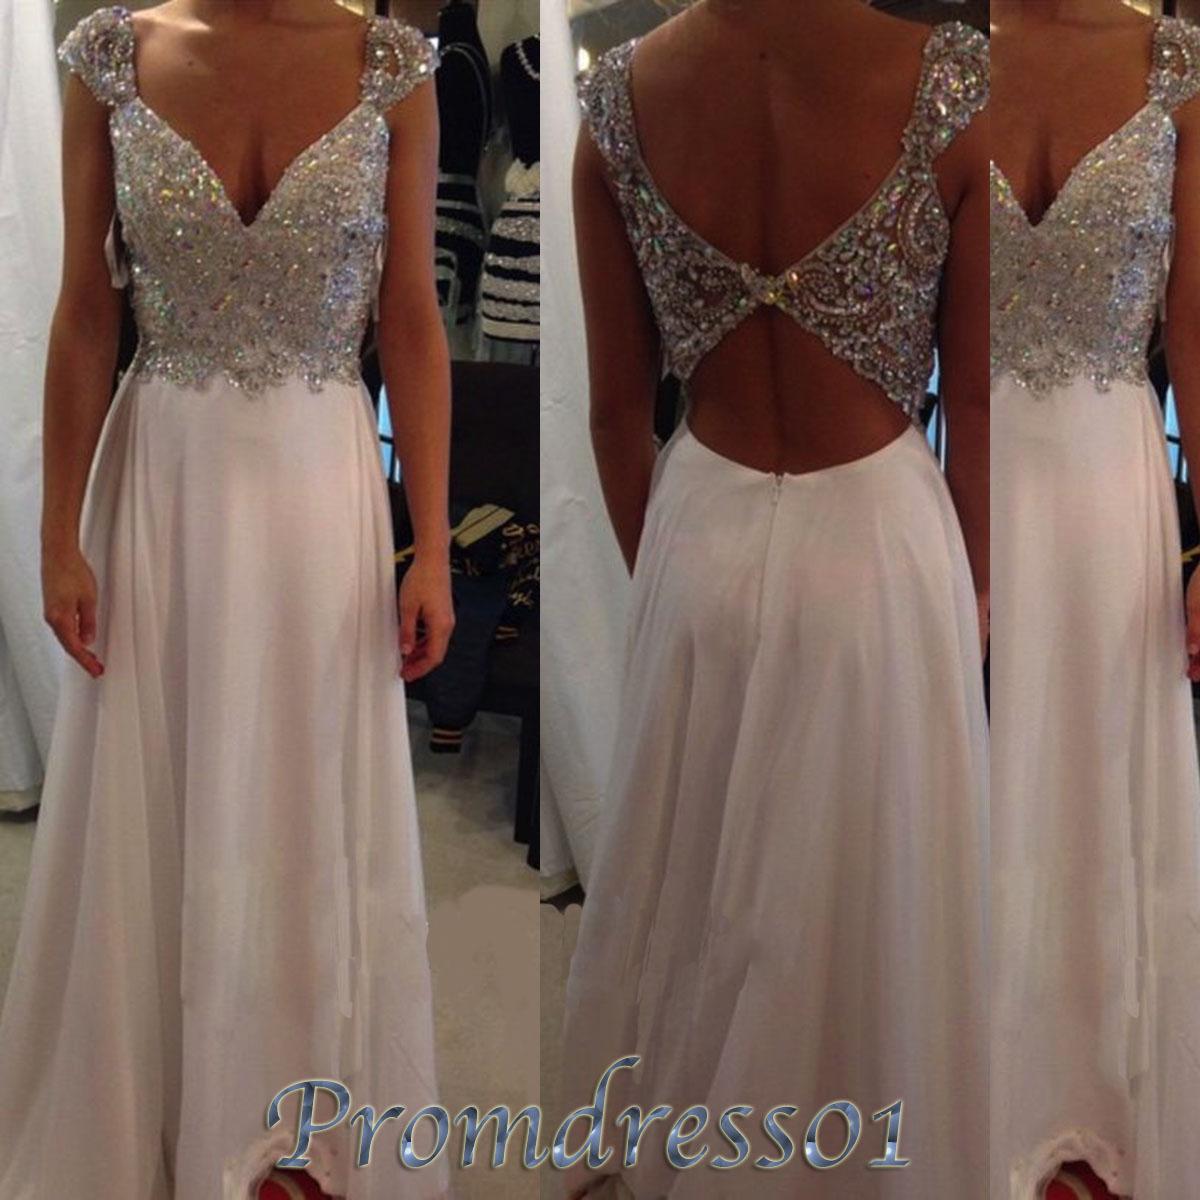 What to wear over a sleeveless dress to a wedding  Abby Nicholson abbynicholsonn on Pinterest